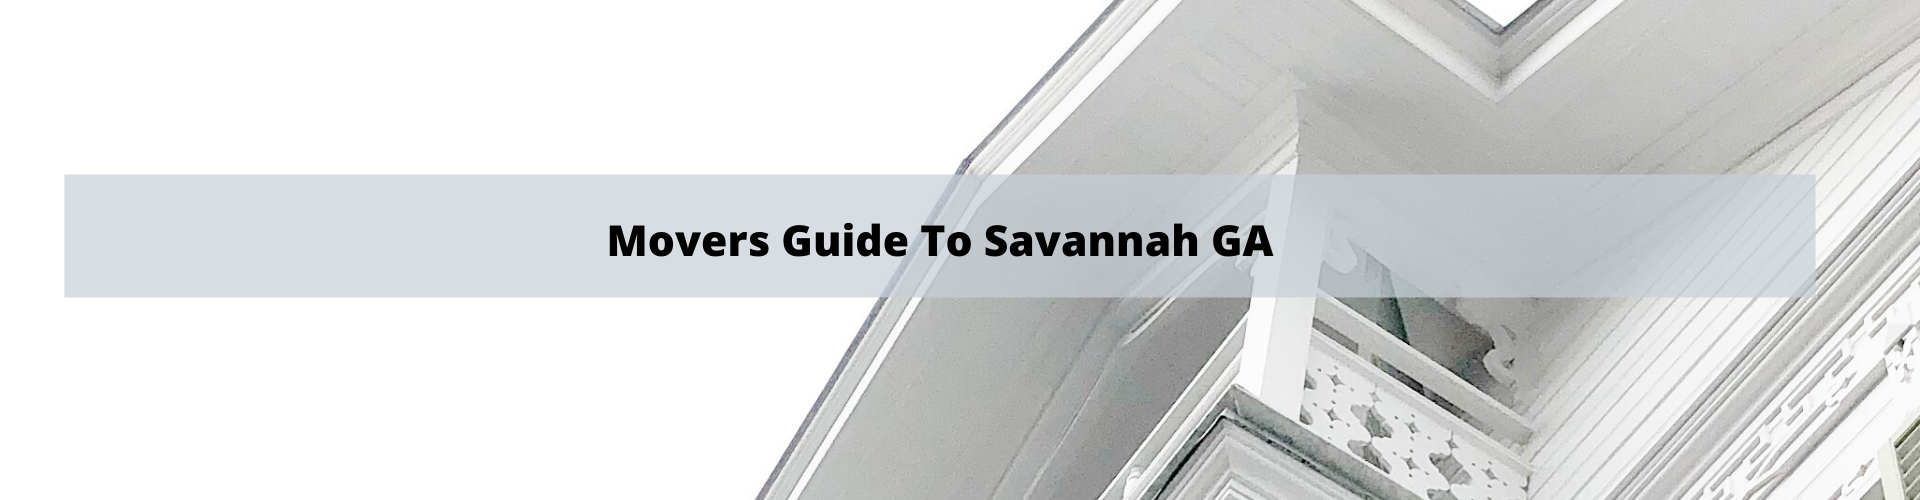 Movers Guide to Savannah GA